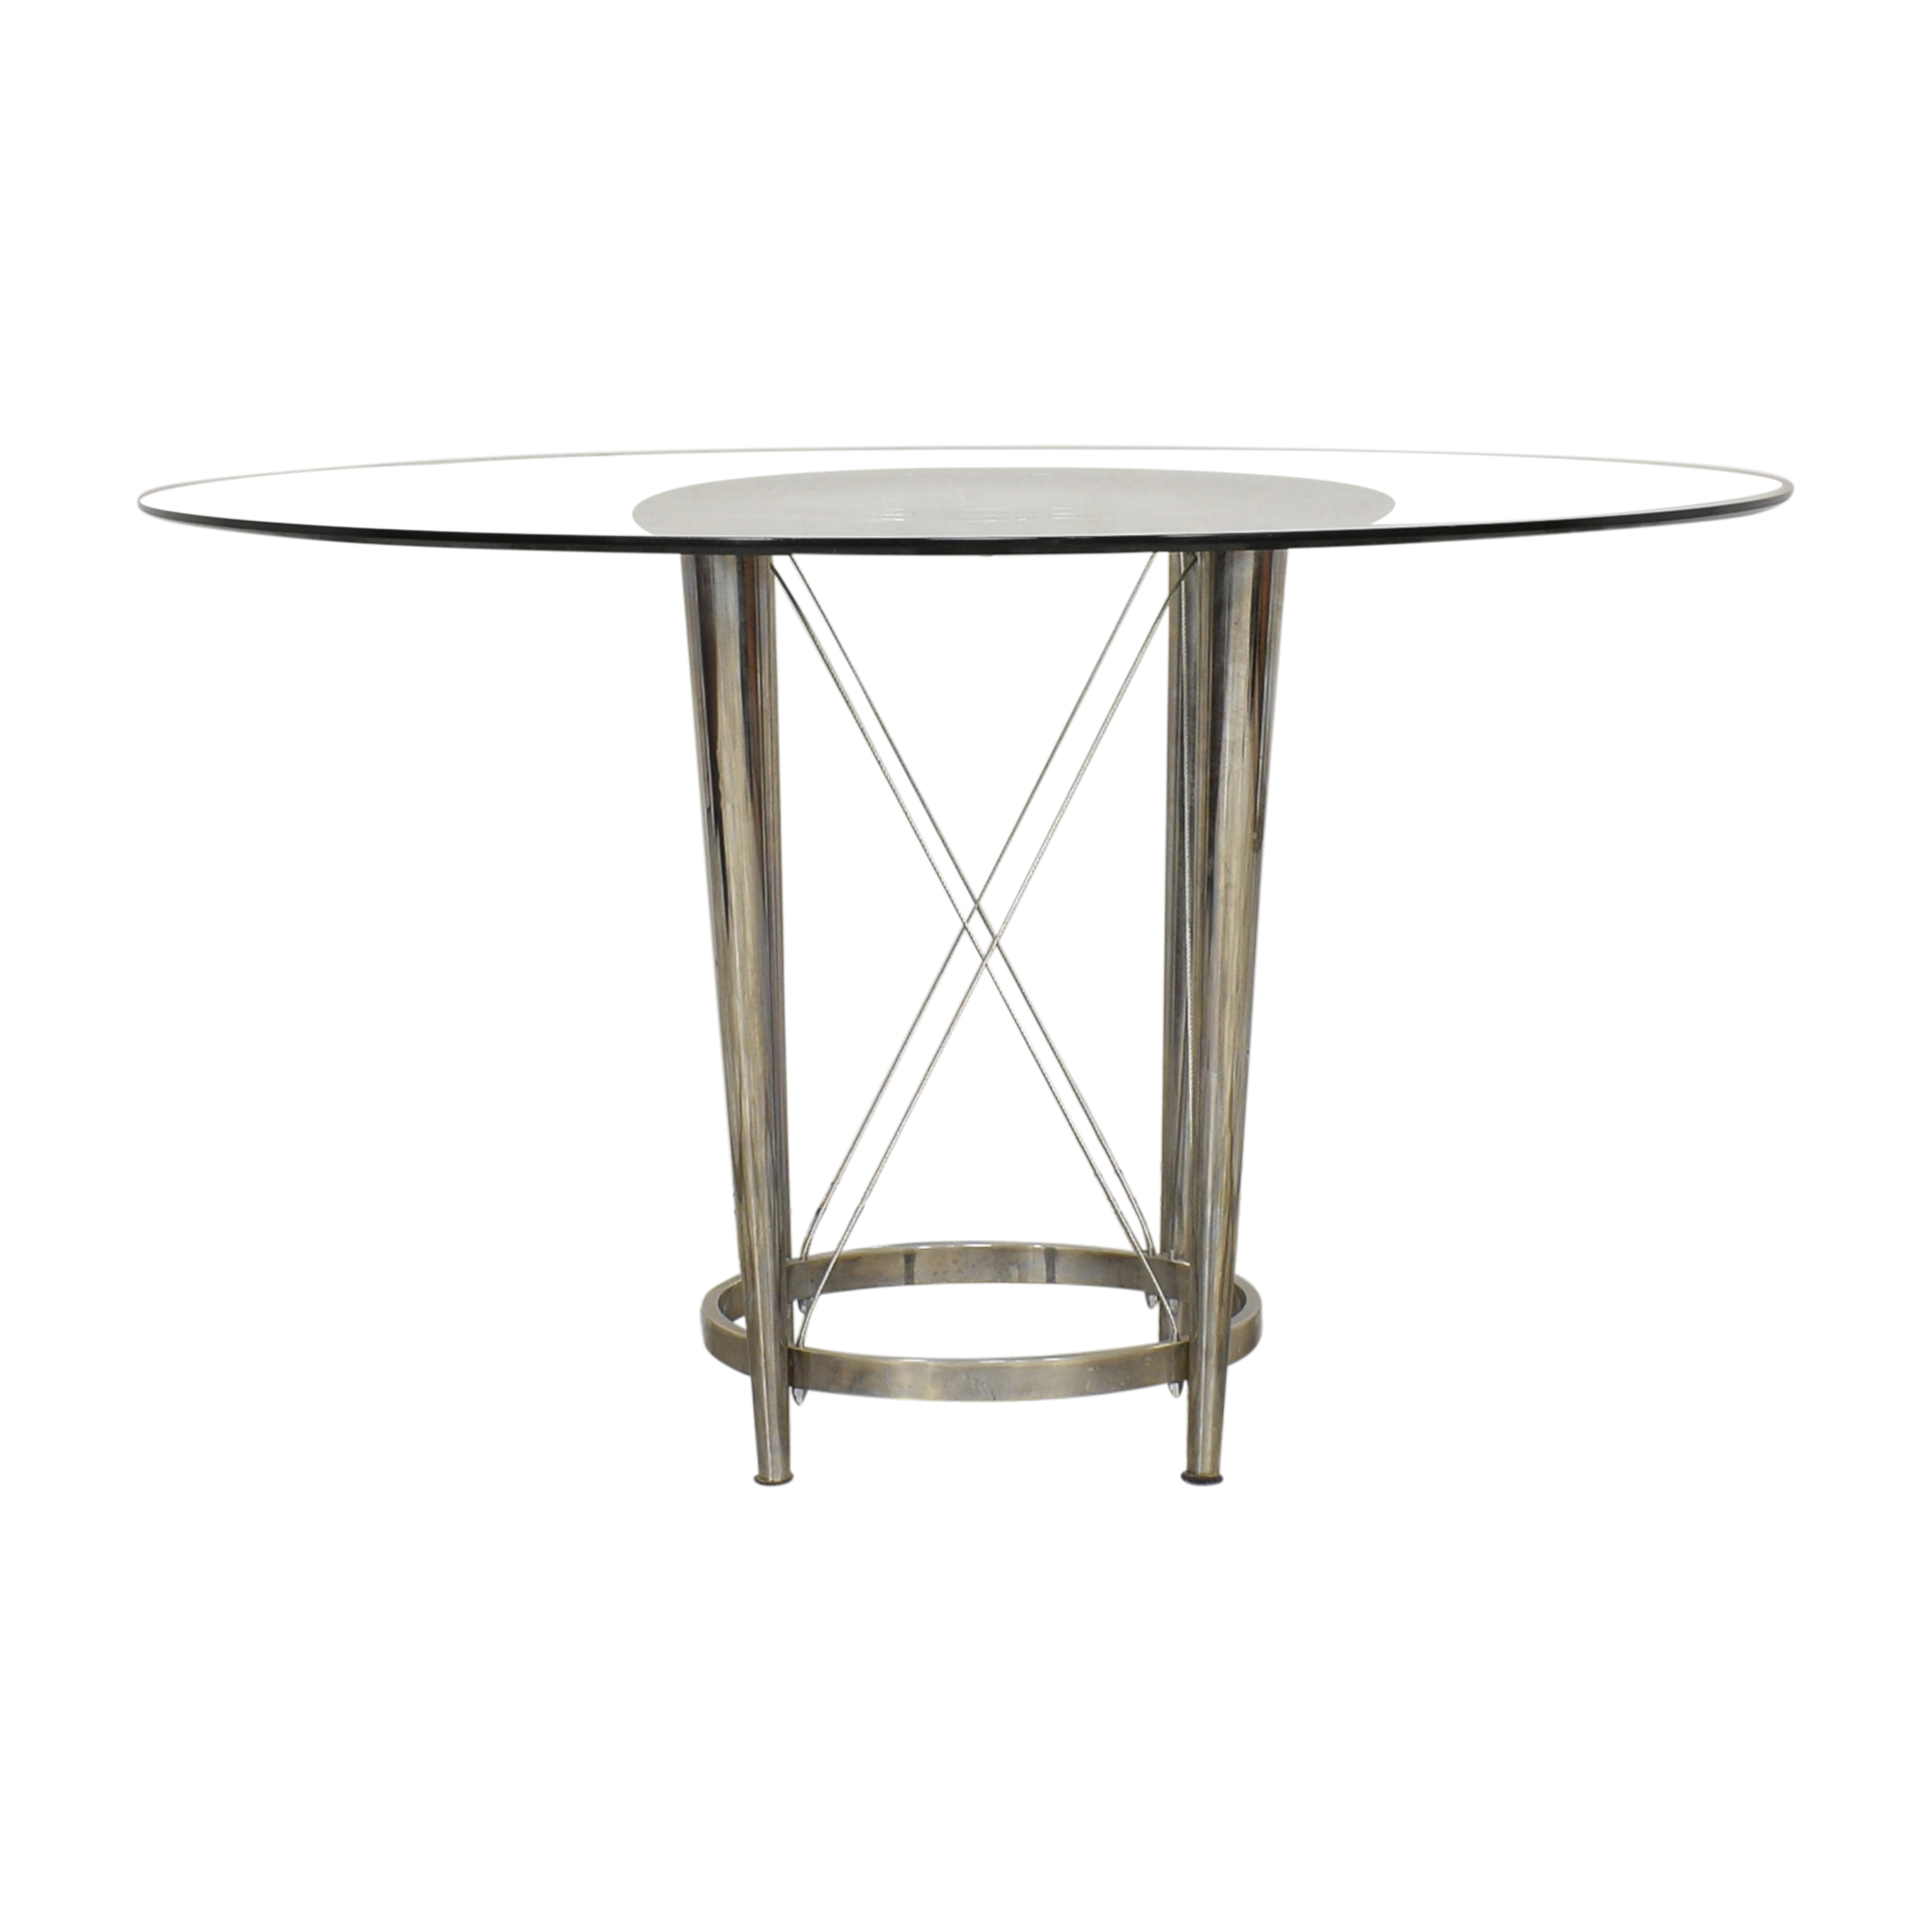 Modern Pedestal Dining Table for sale